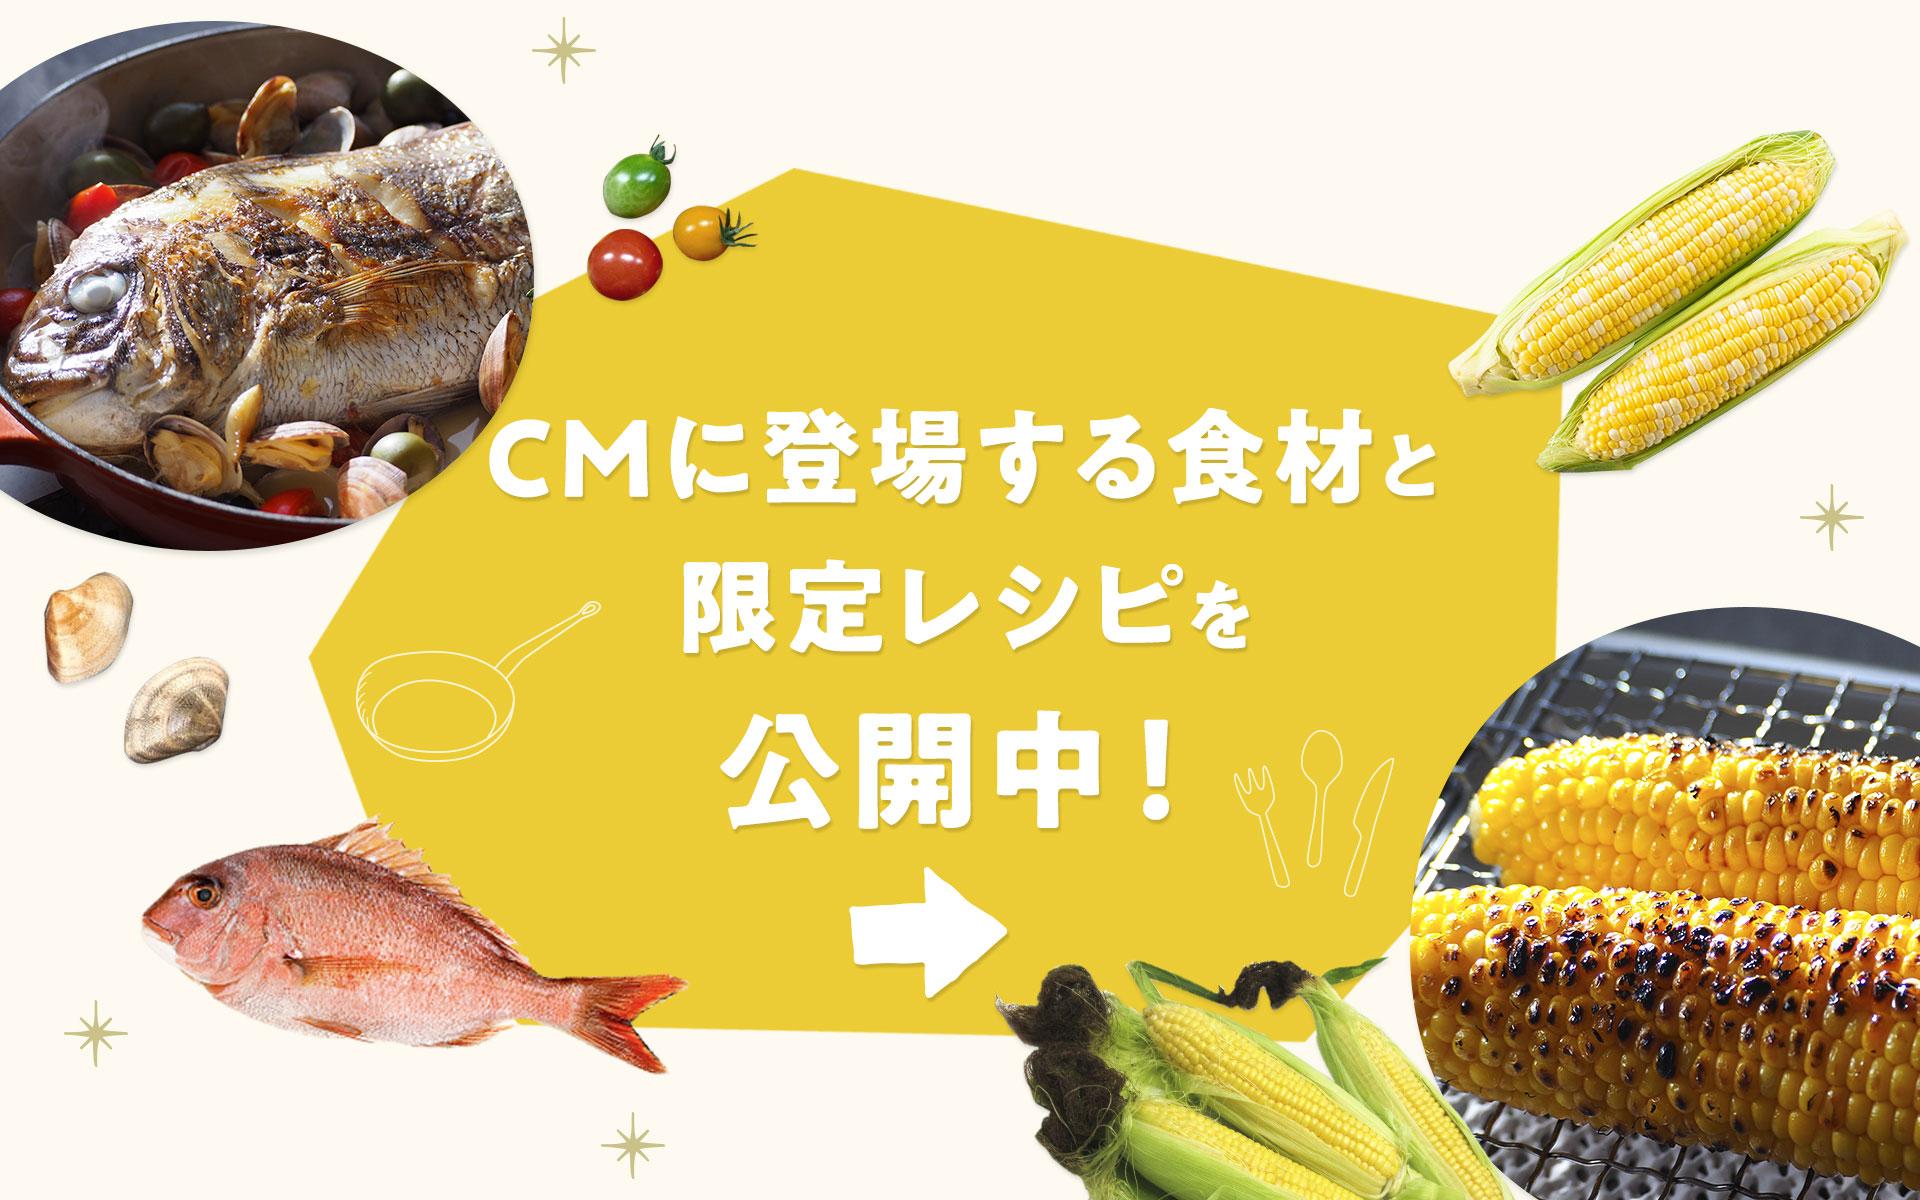 CMに登場する食材と限定レシピを公開中!|産直アウル